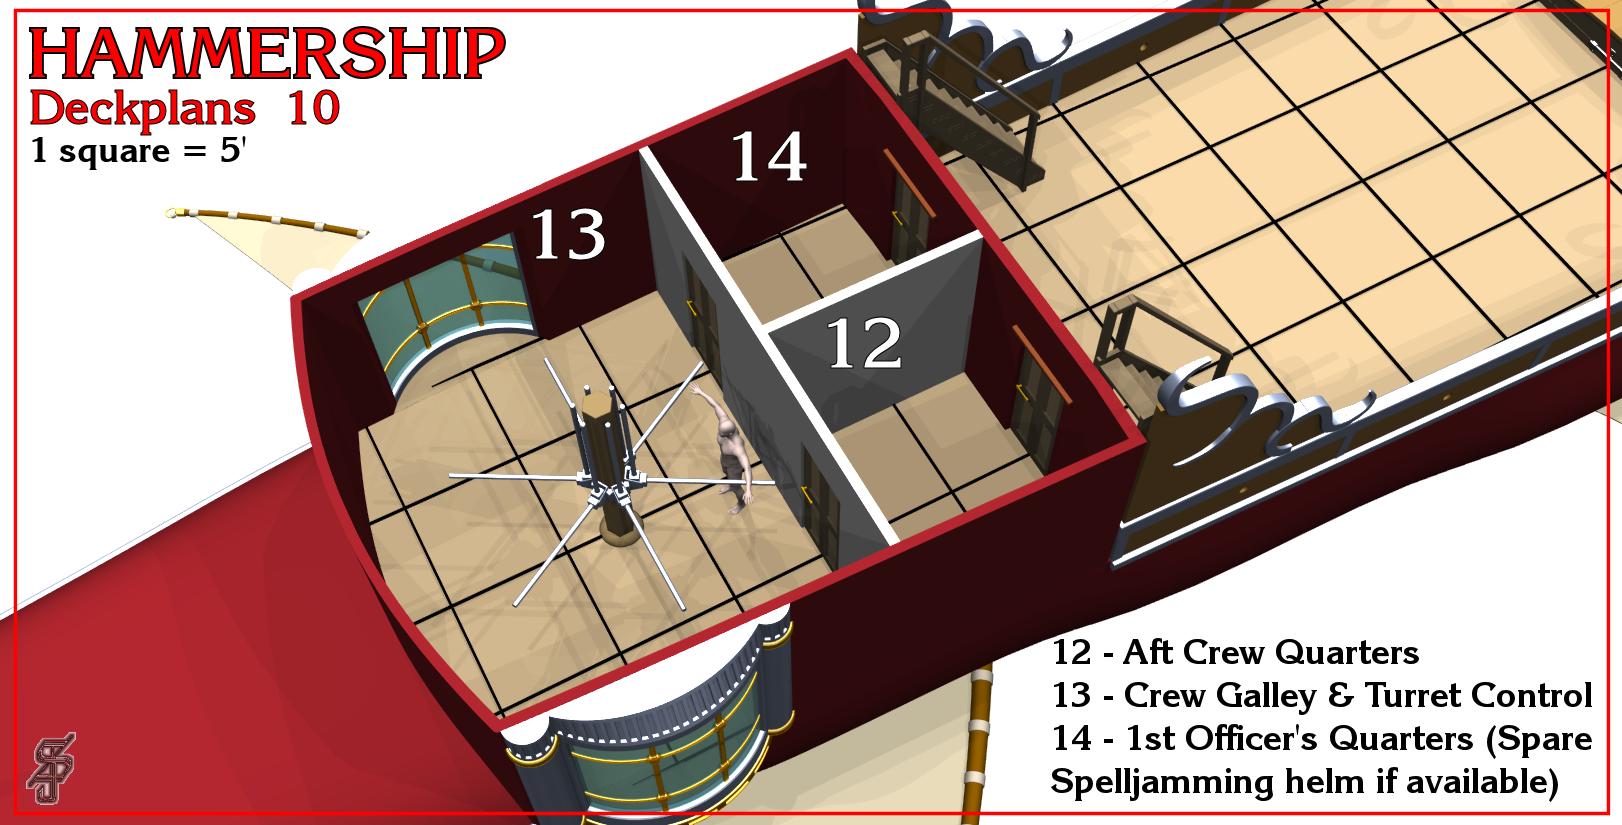 Hammership layout 10